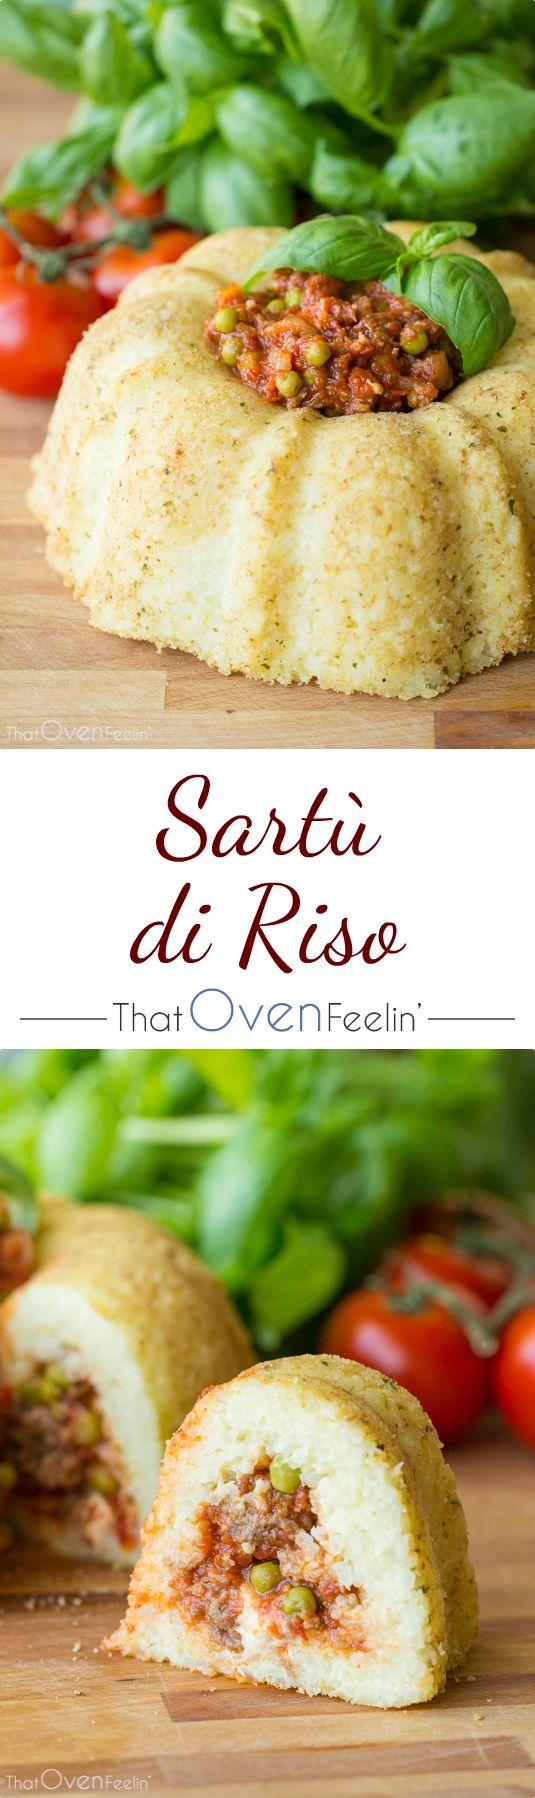 Sartù di Riso (Meatball, Sausage, and Rice Timbale)